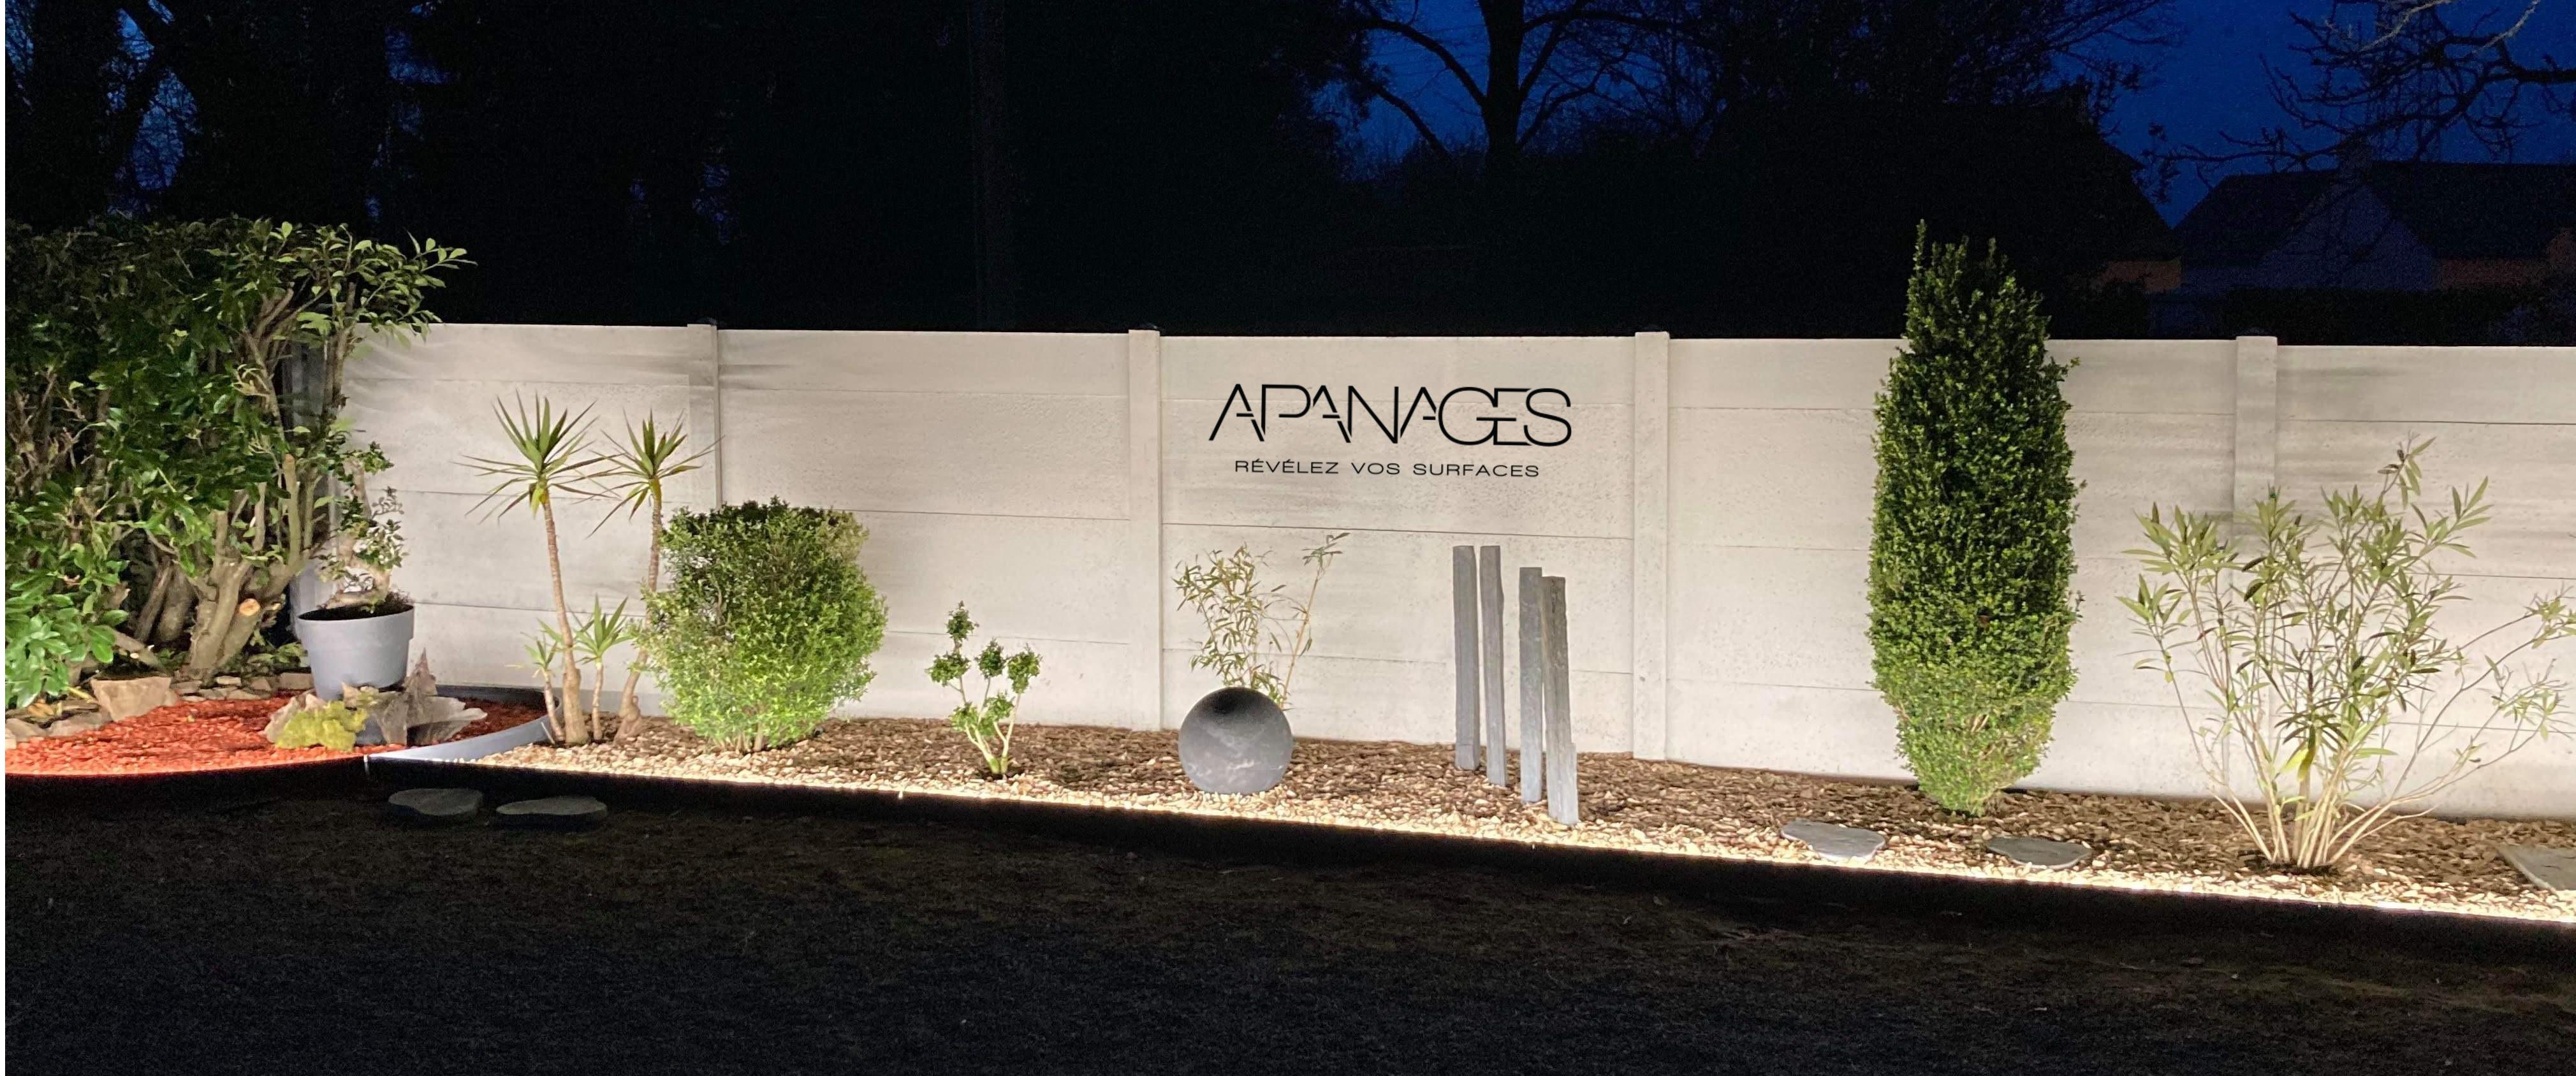 bordure-volige-jardin-aluminium-métallique-acier-fer-déliitation-pelouse-allée-gazon-bande-de-propreté